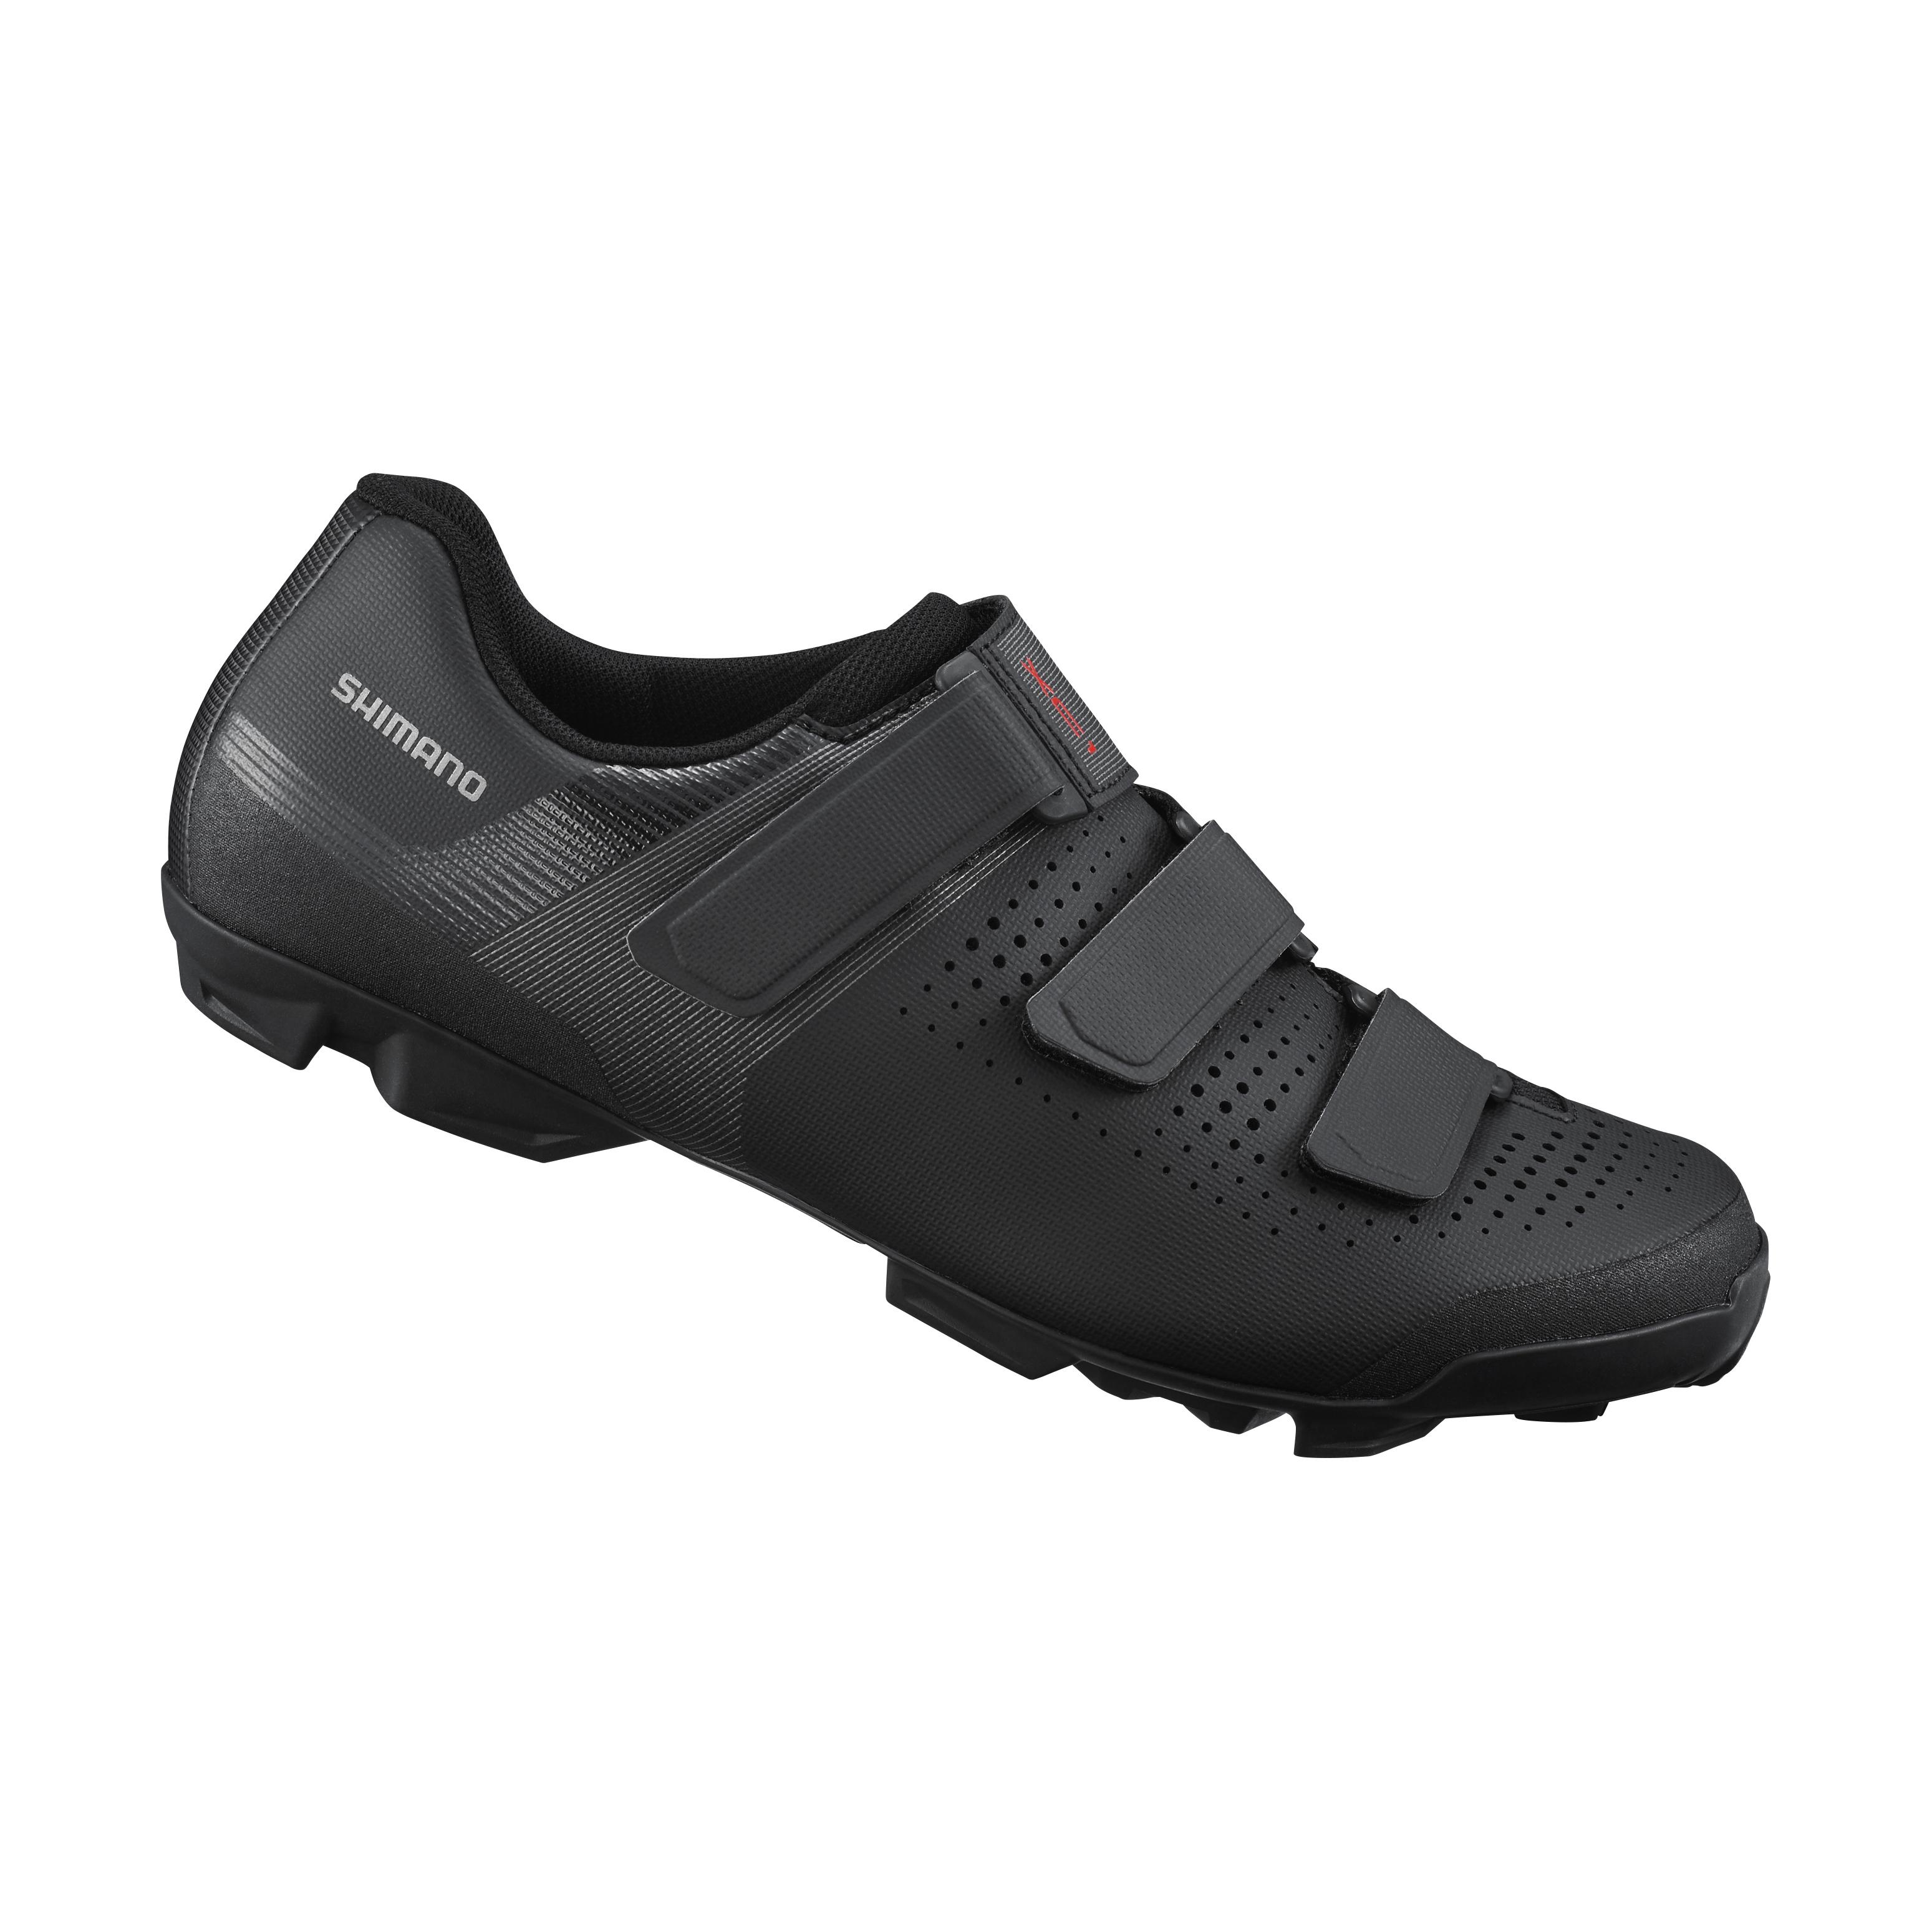 SHIMANO MTB obuv SH-XC100, černá, 39